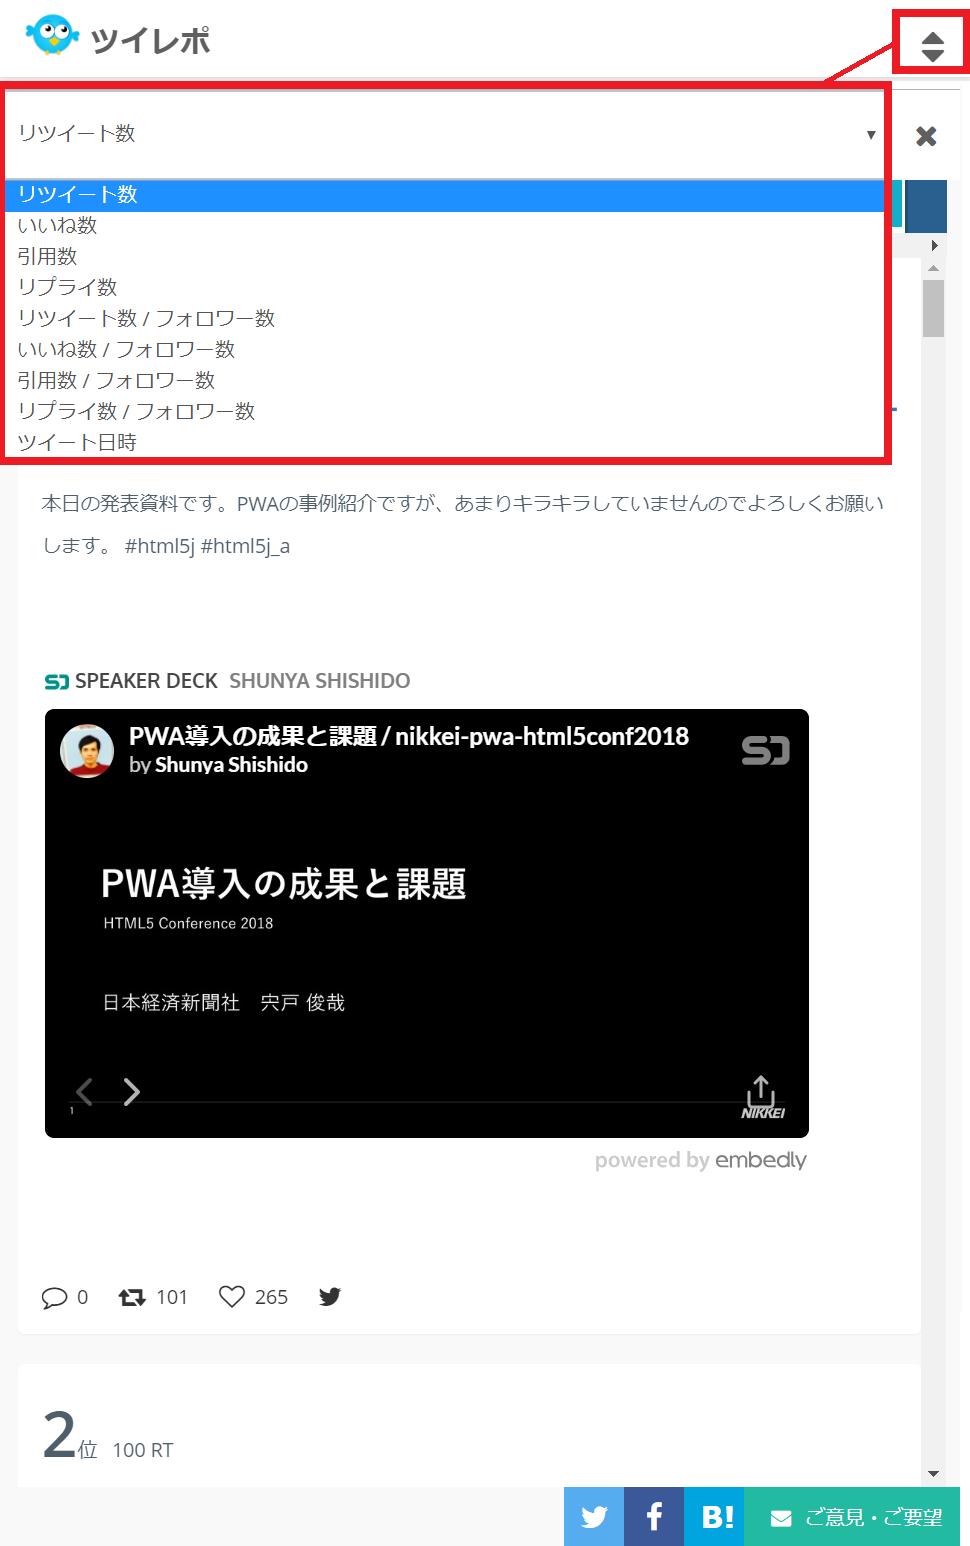 twirepo_screenshot_sort.png